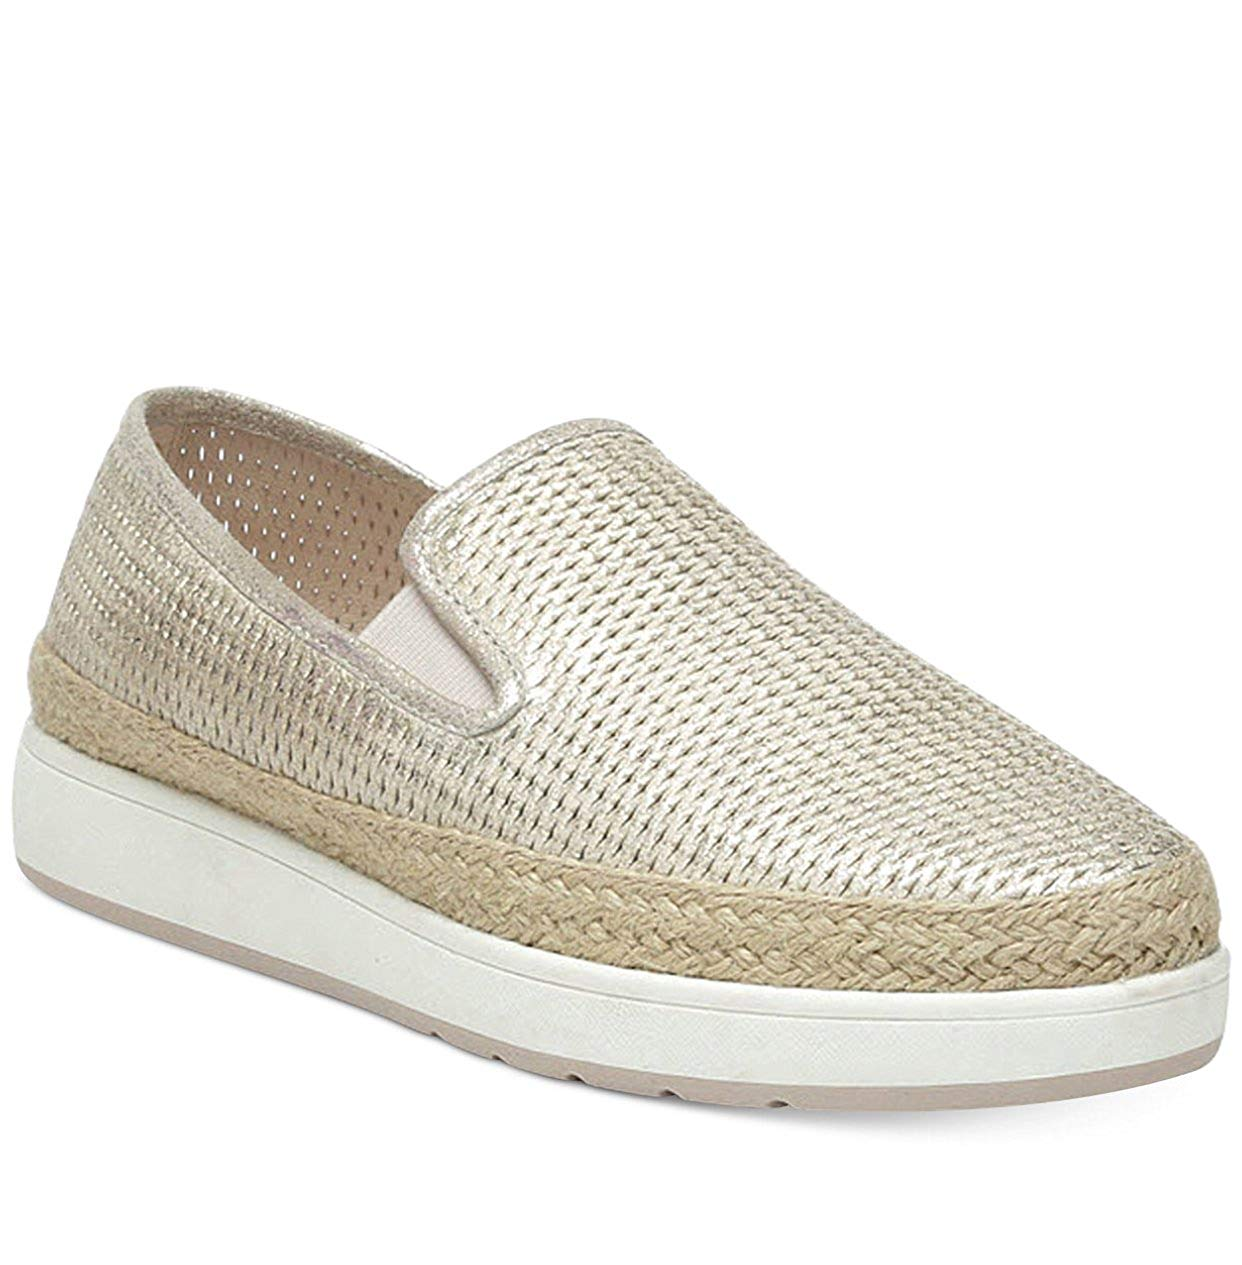 Donald J Pliner Womens Maite-Ol Fabric Low Top Slip On Fashion Sneakers